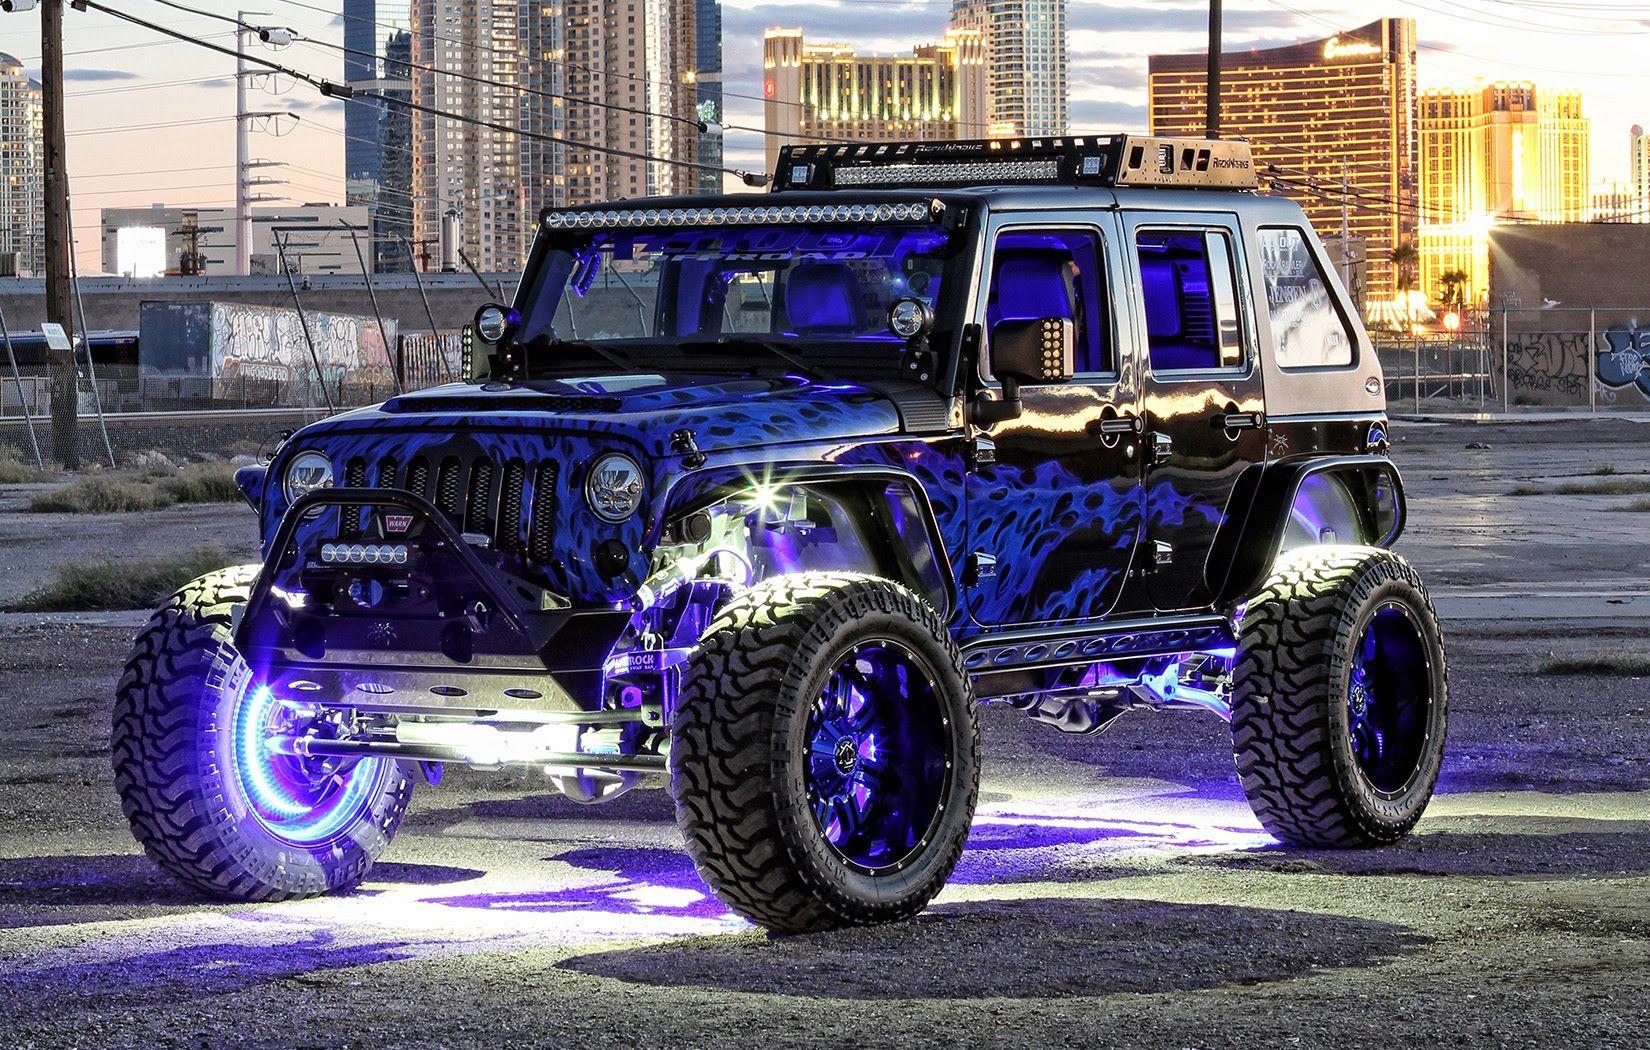 Project Hope Jeep Wrangler Jk Jeep Wrangler Jeep Wrangler Jk